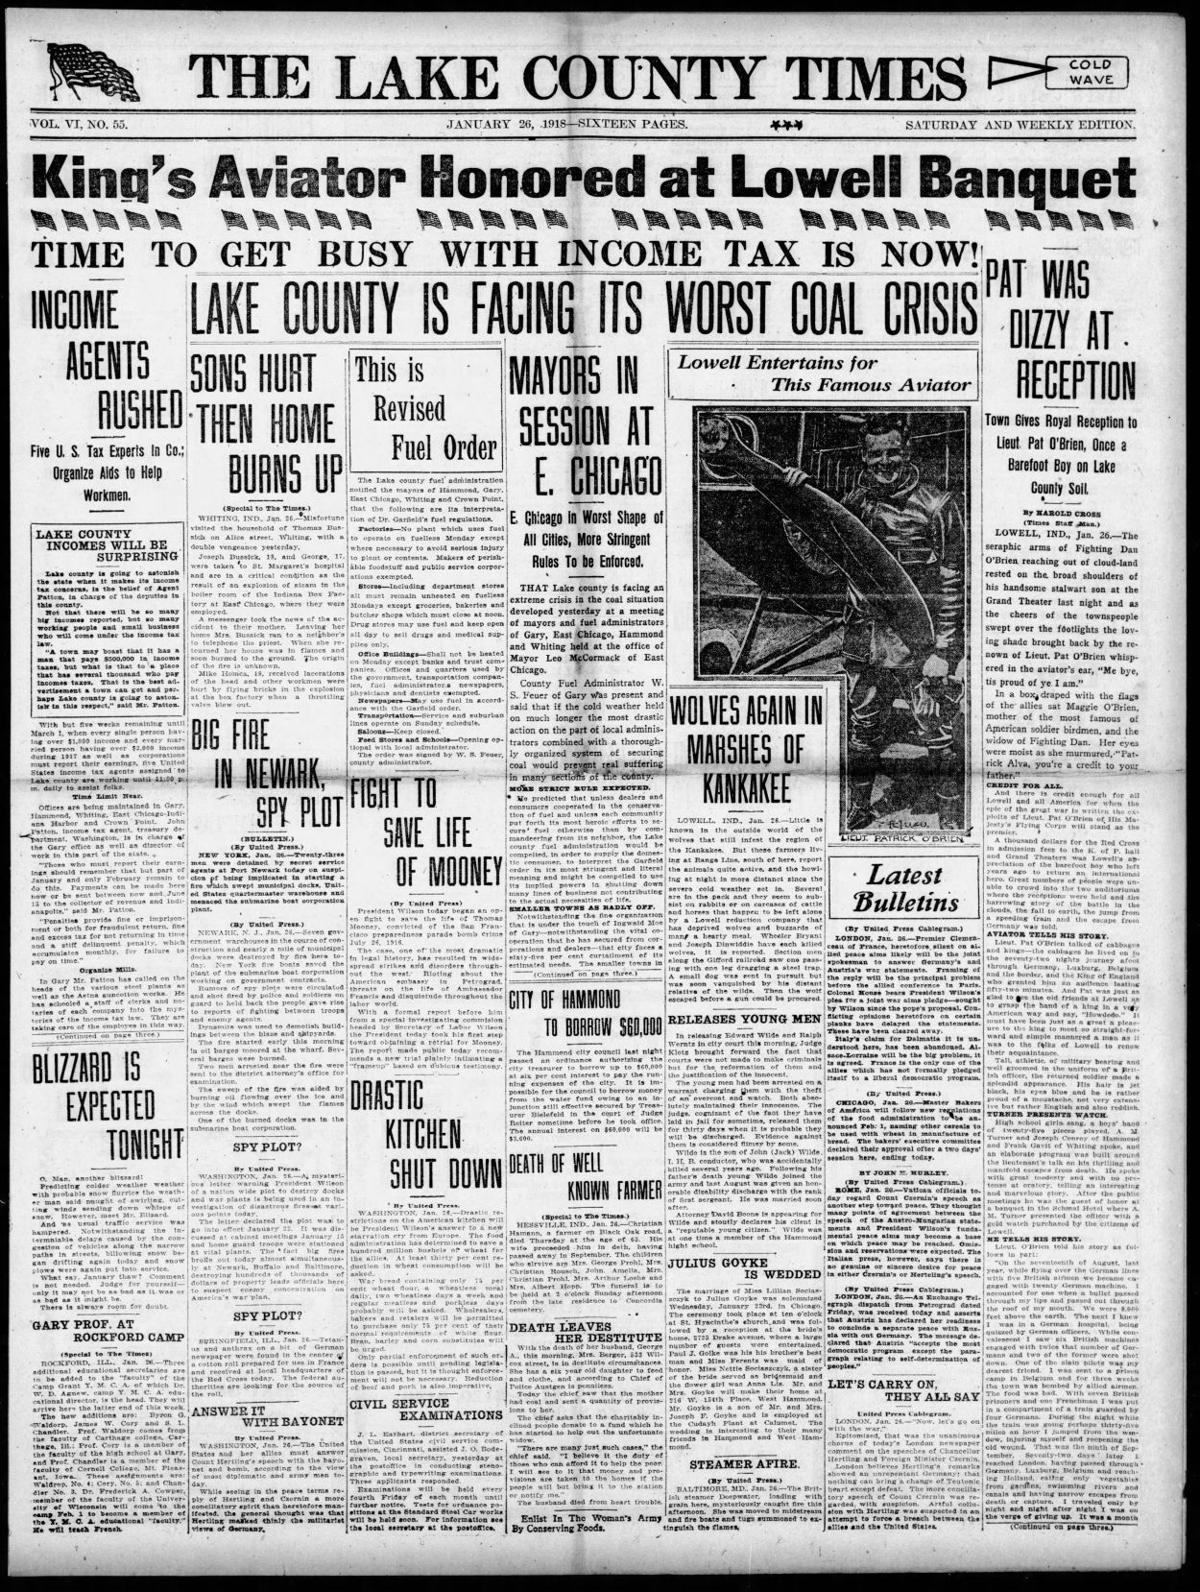 Jan. 26, 1918: Lake County Is Facing Its Worst Coal Crisis